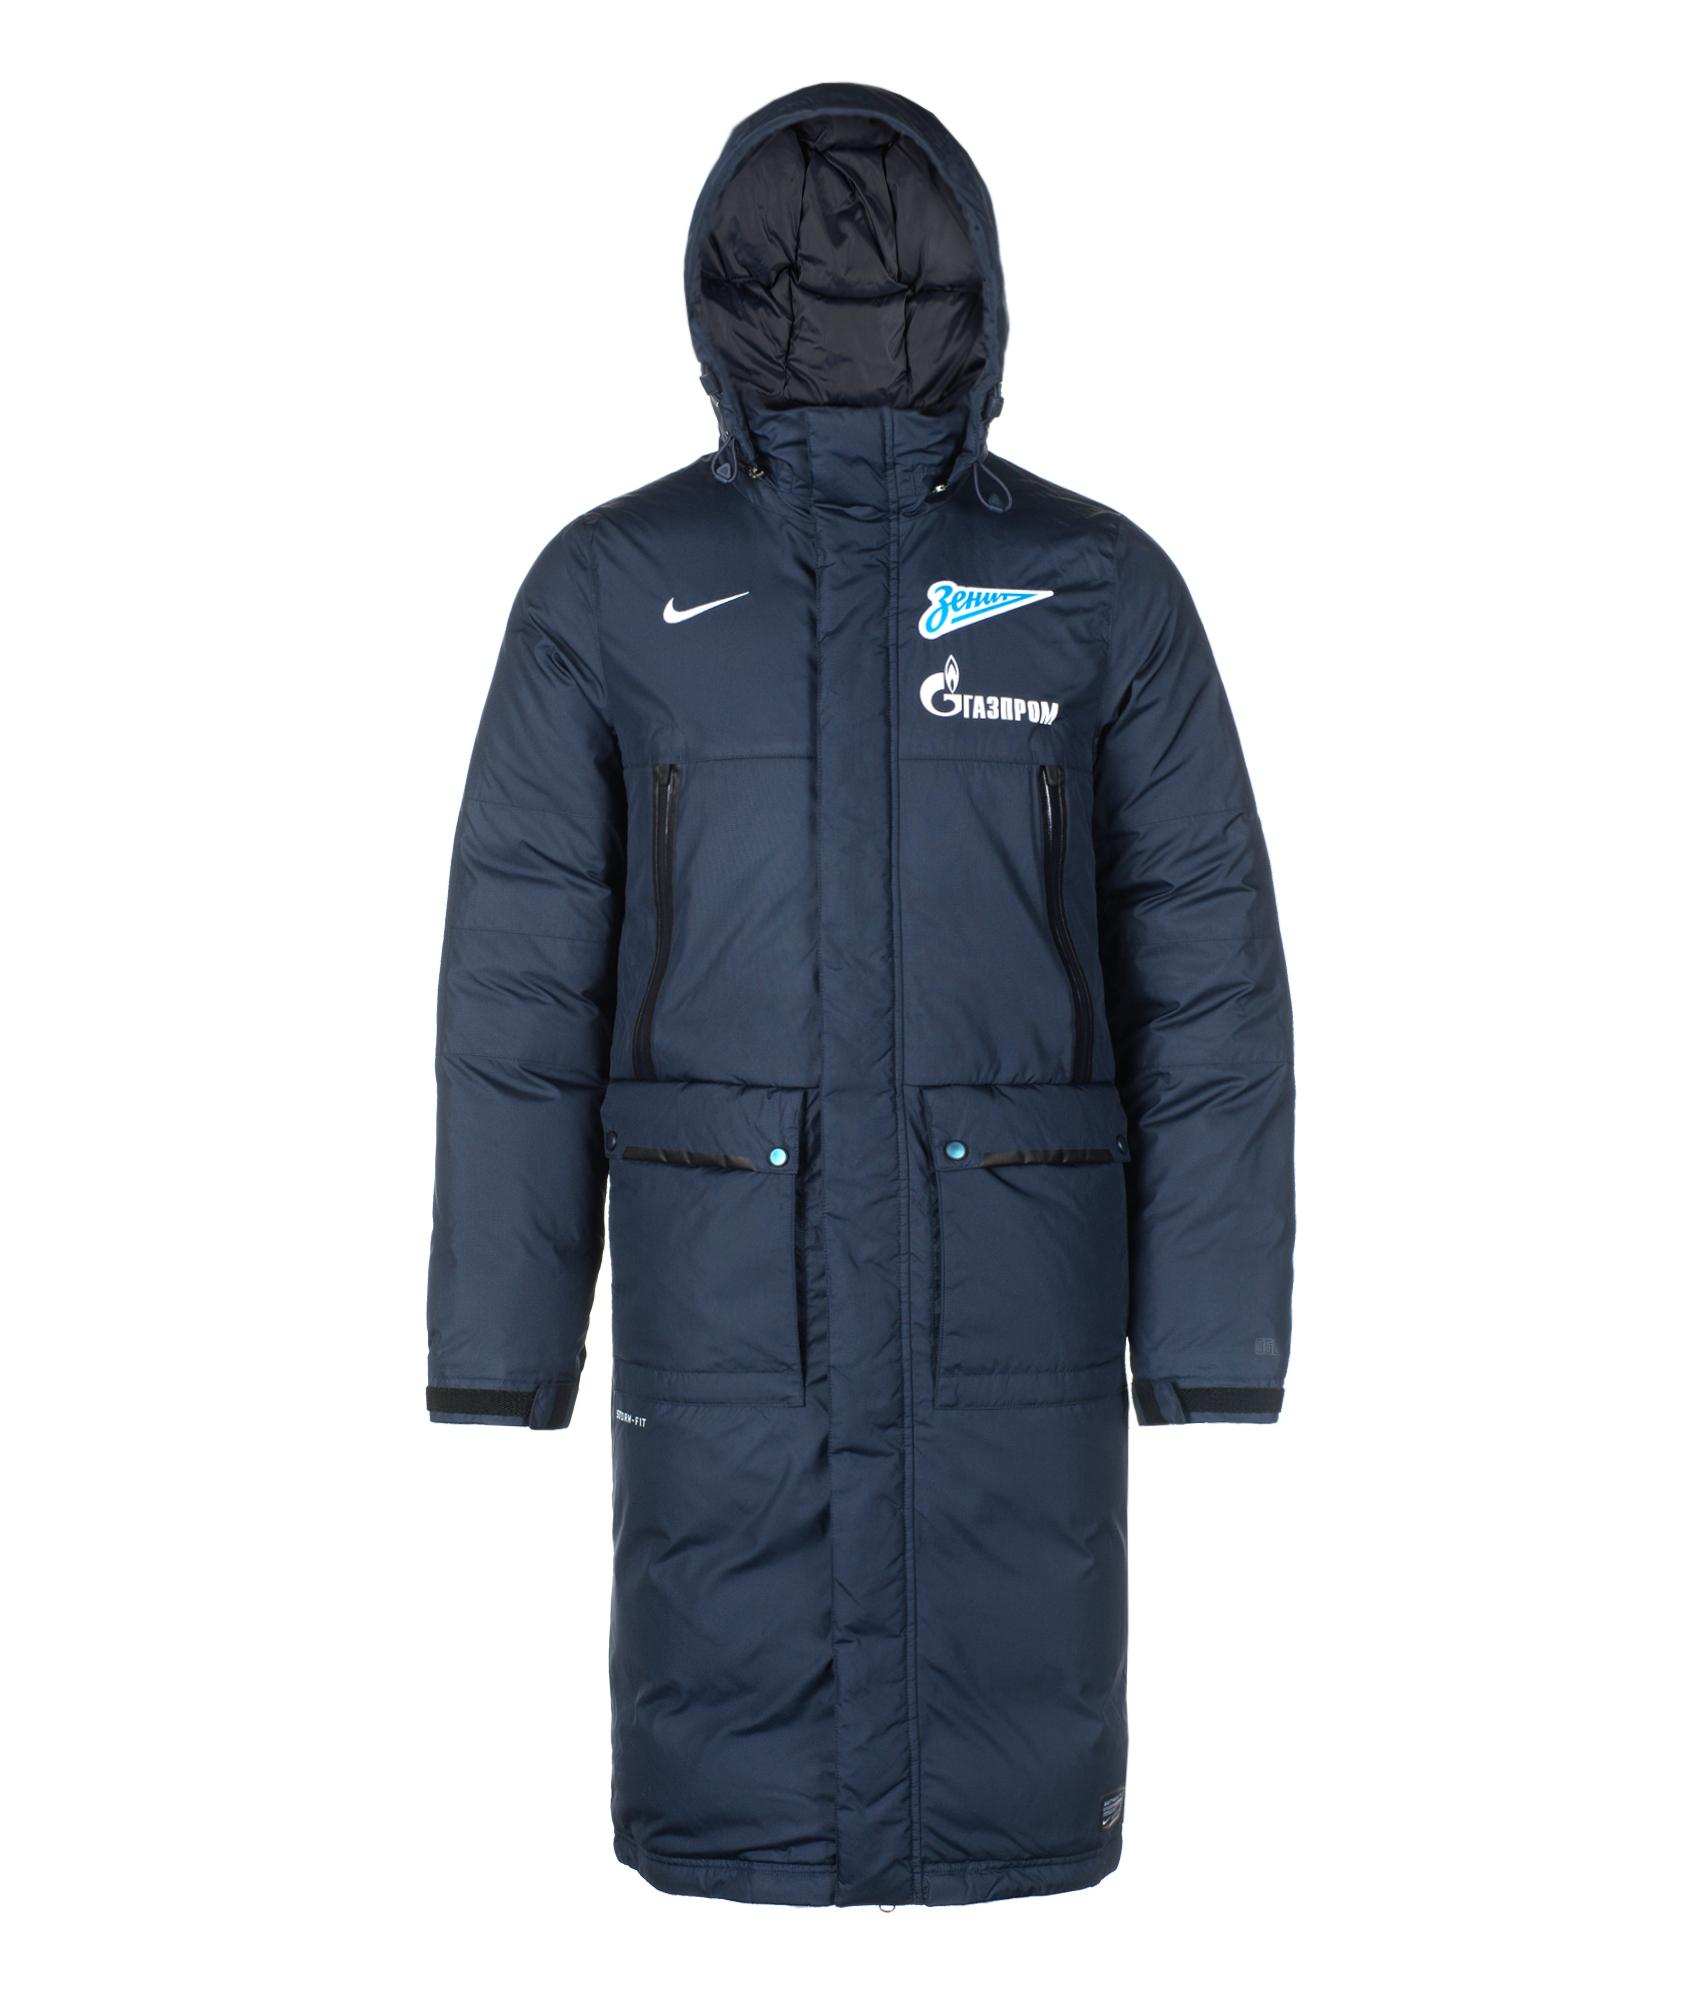 Пуховик удлиненный Nike ZENIT SELECT DOWN LGR JKT, Цвет-Синий, Размер-XL